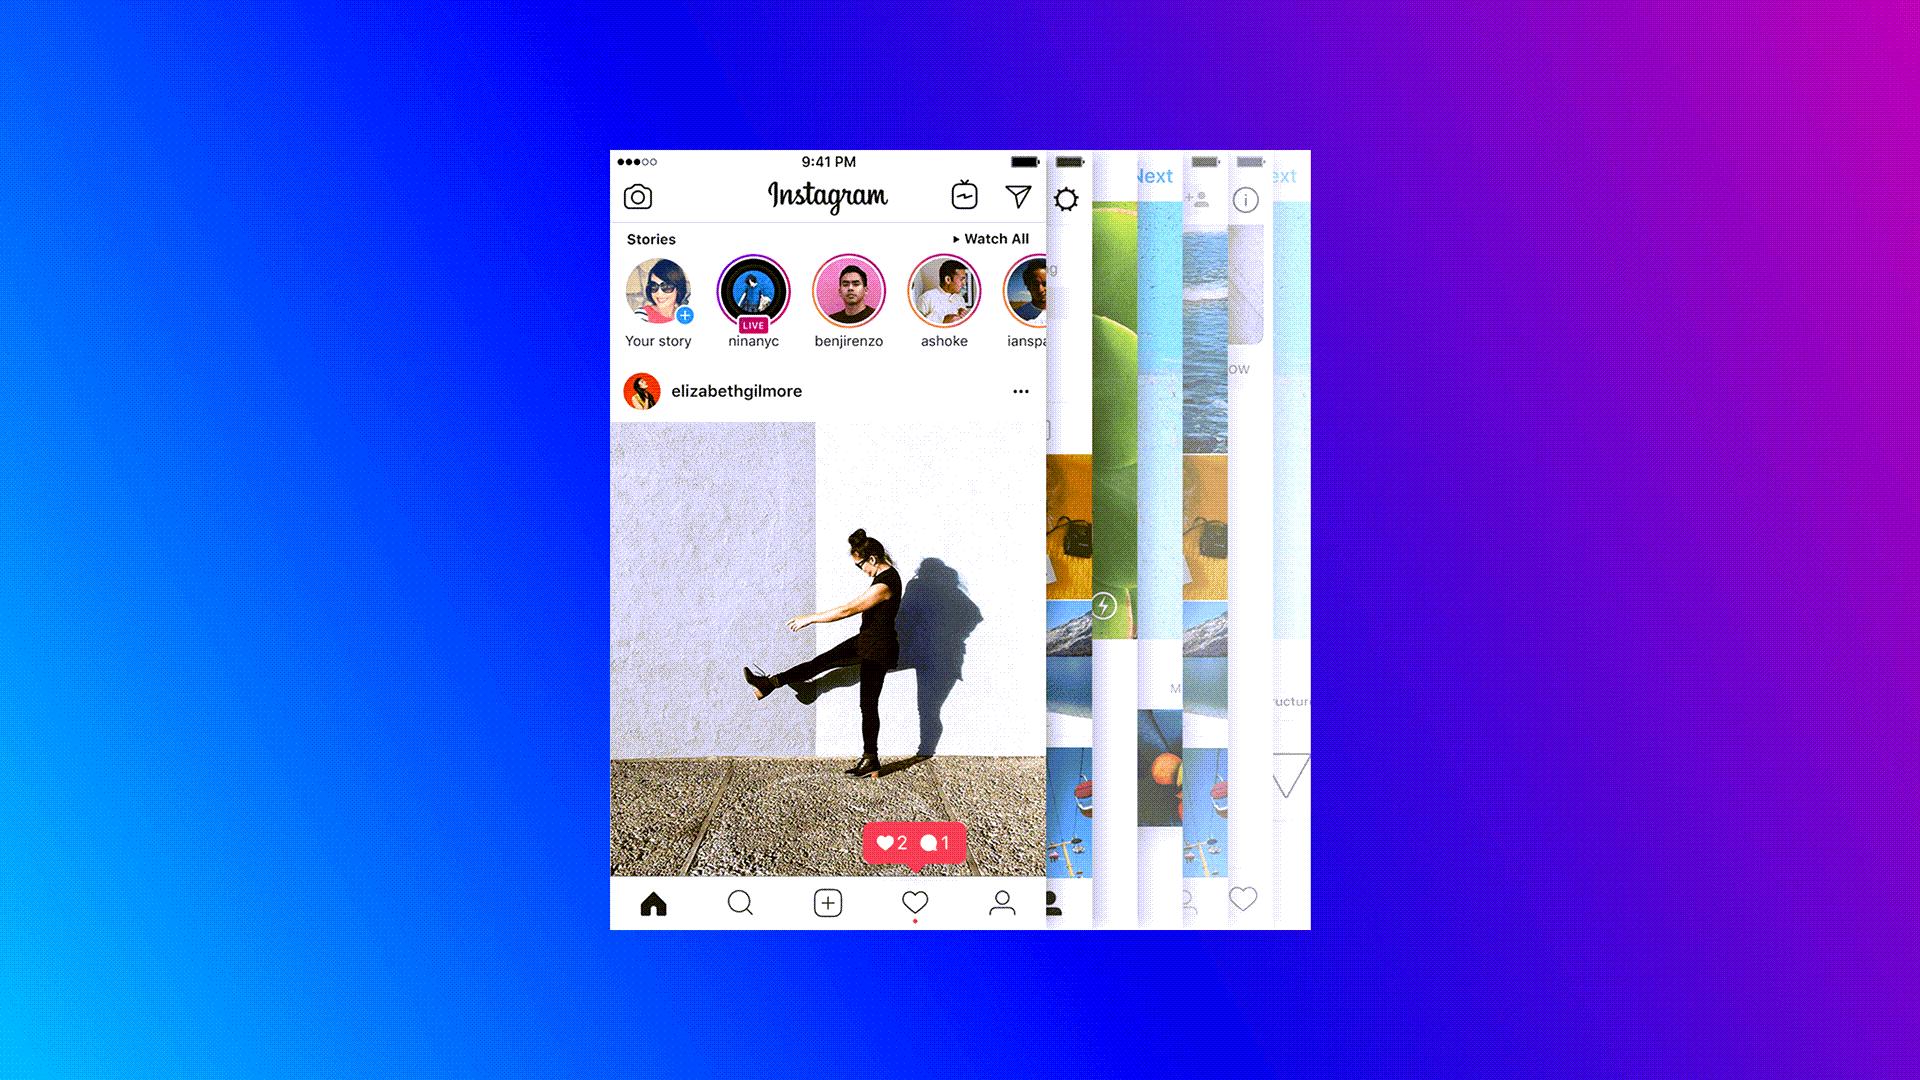 Instagram Reels integrating short-form videos to their site